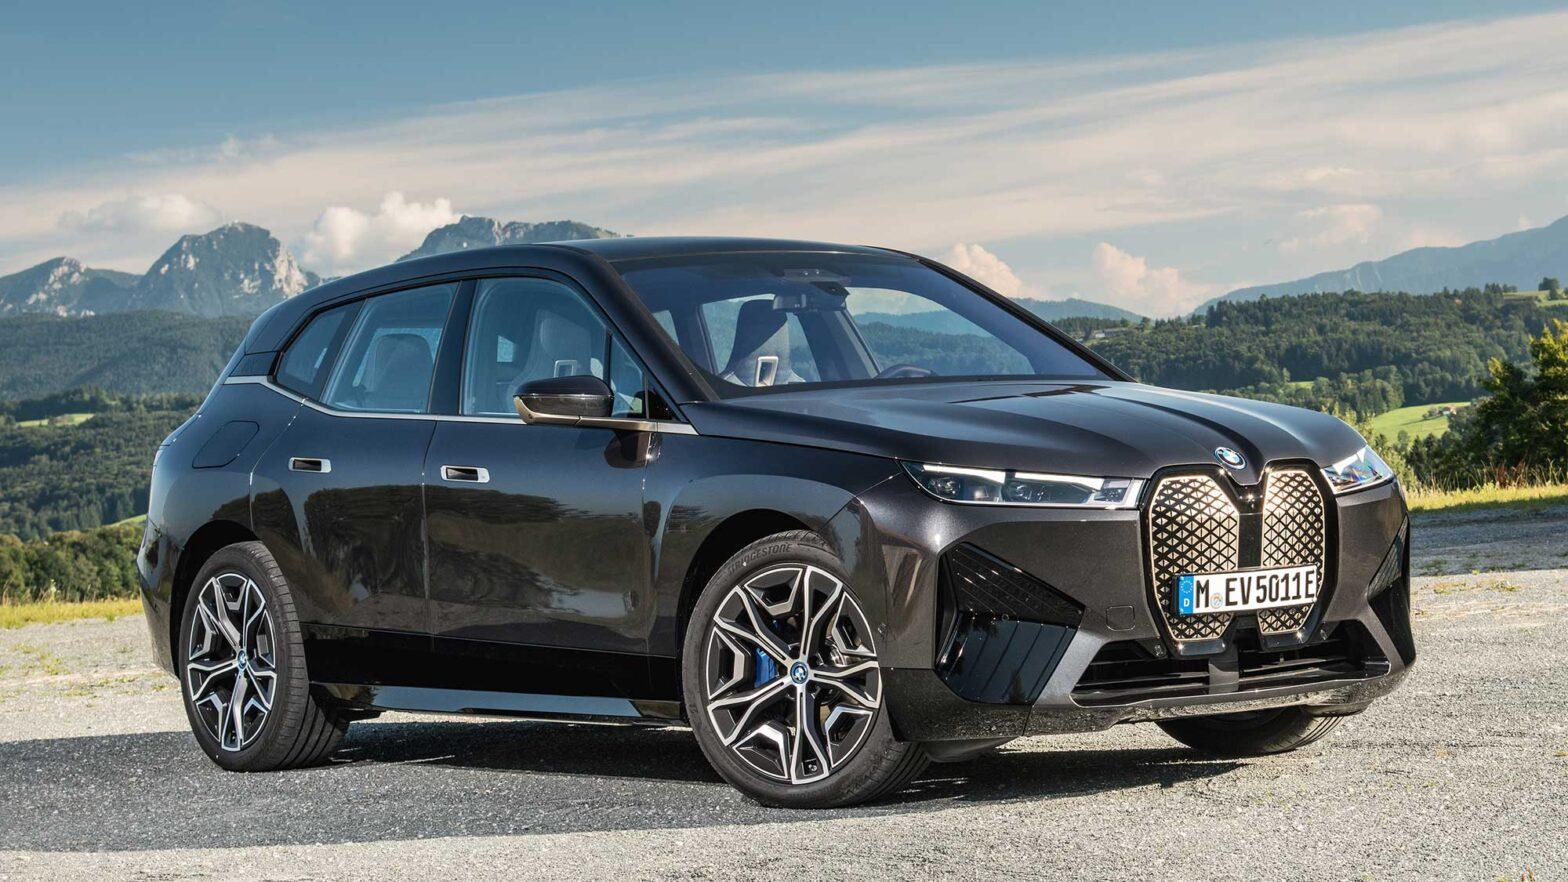 2022 BMW iX All-Electric Sports Utility Vehicle